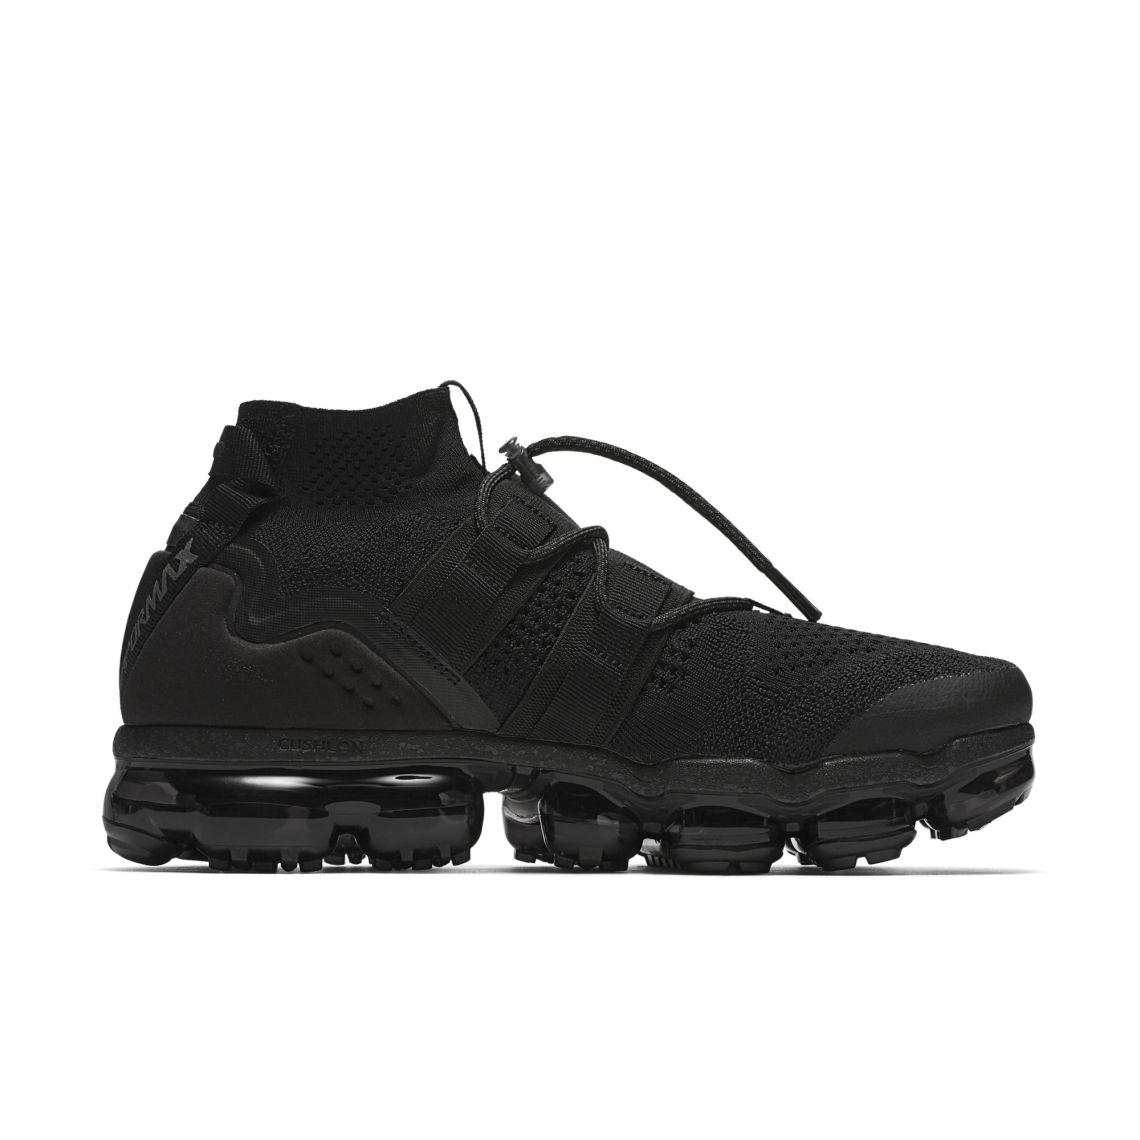 Nike Air Vapormax Flyknit Triple Black